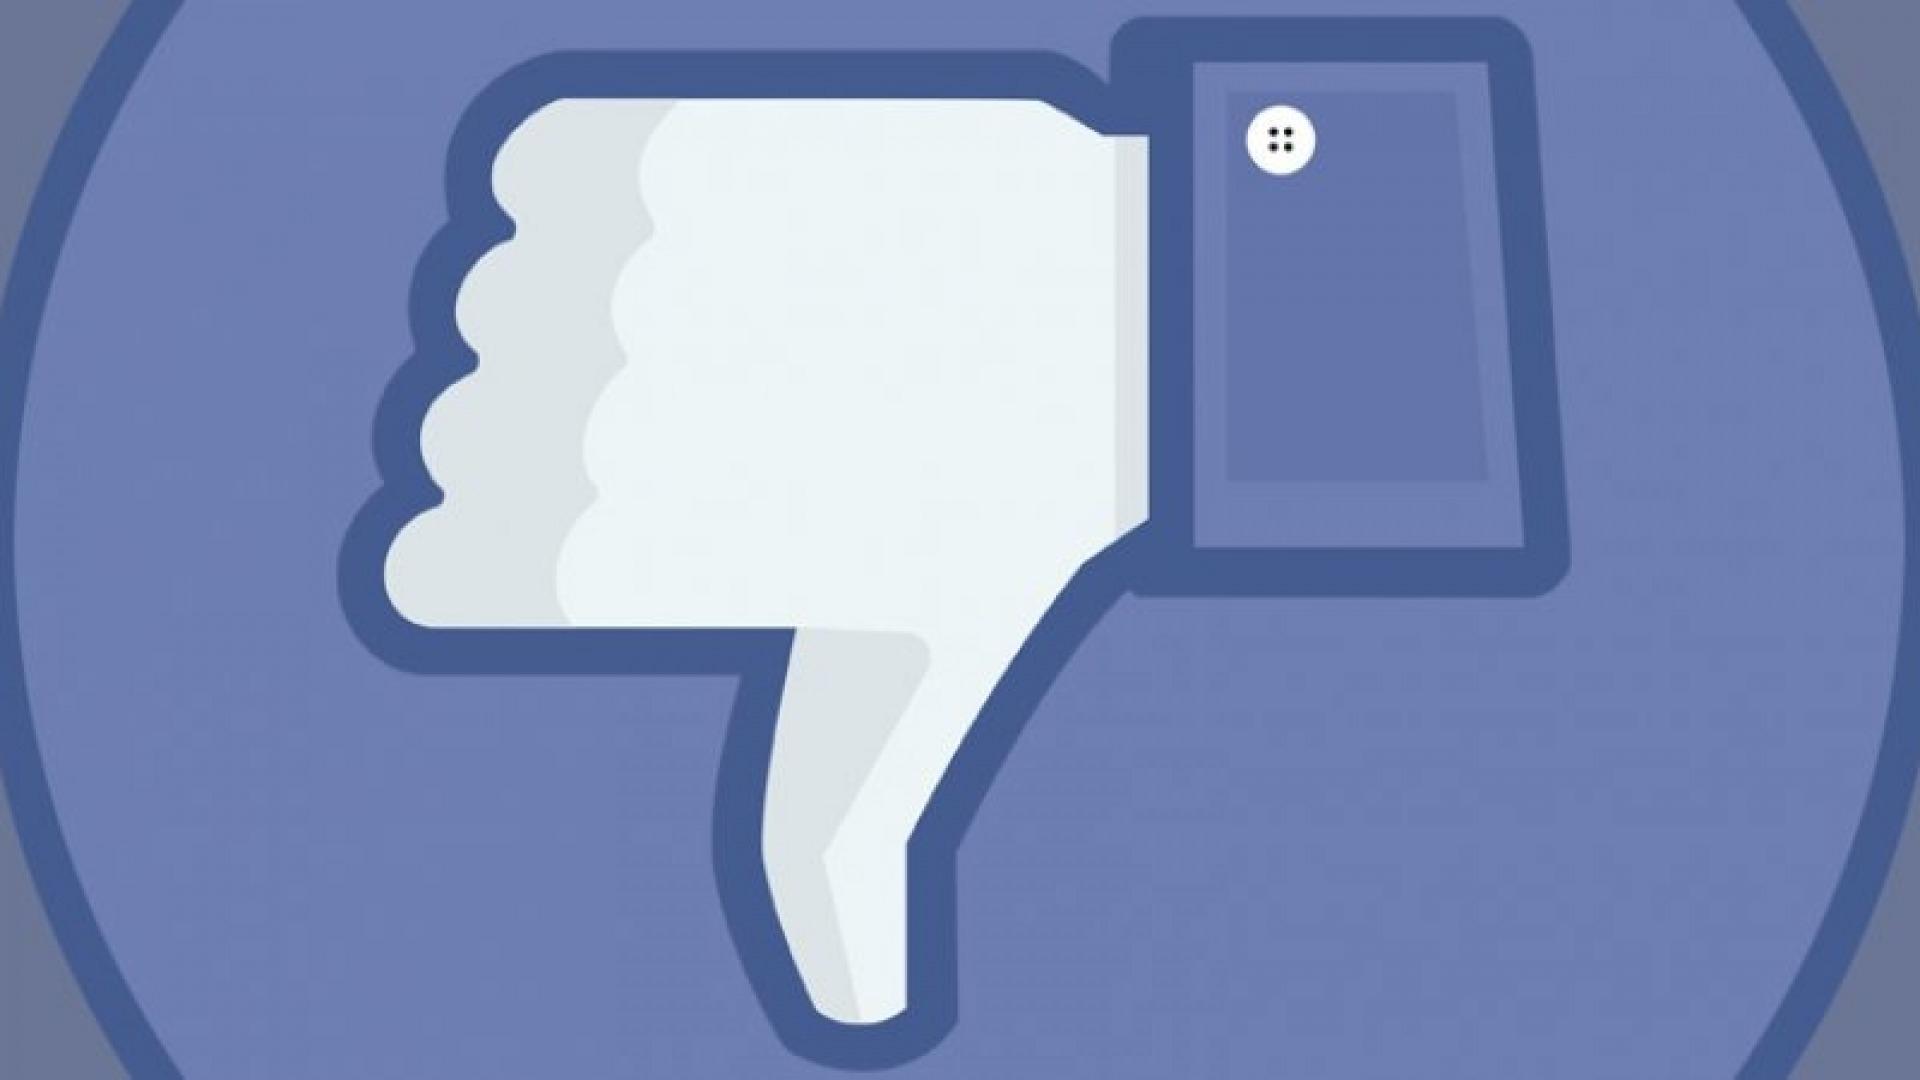 immagine blog Gestire una crisi sui social media